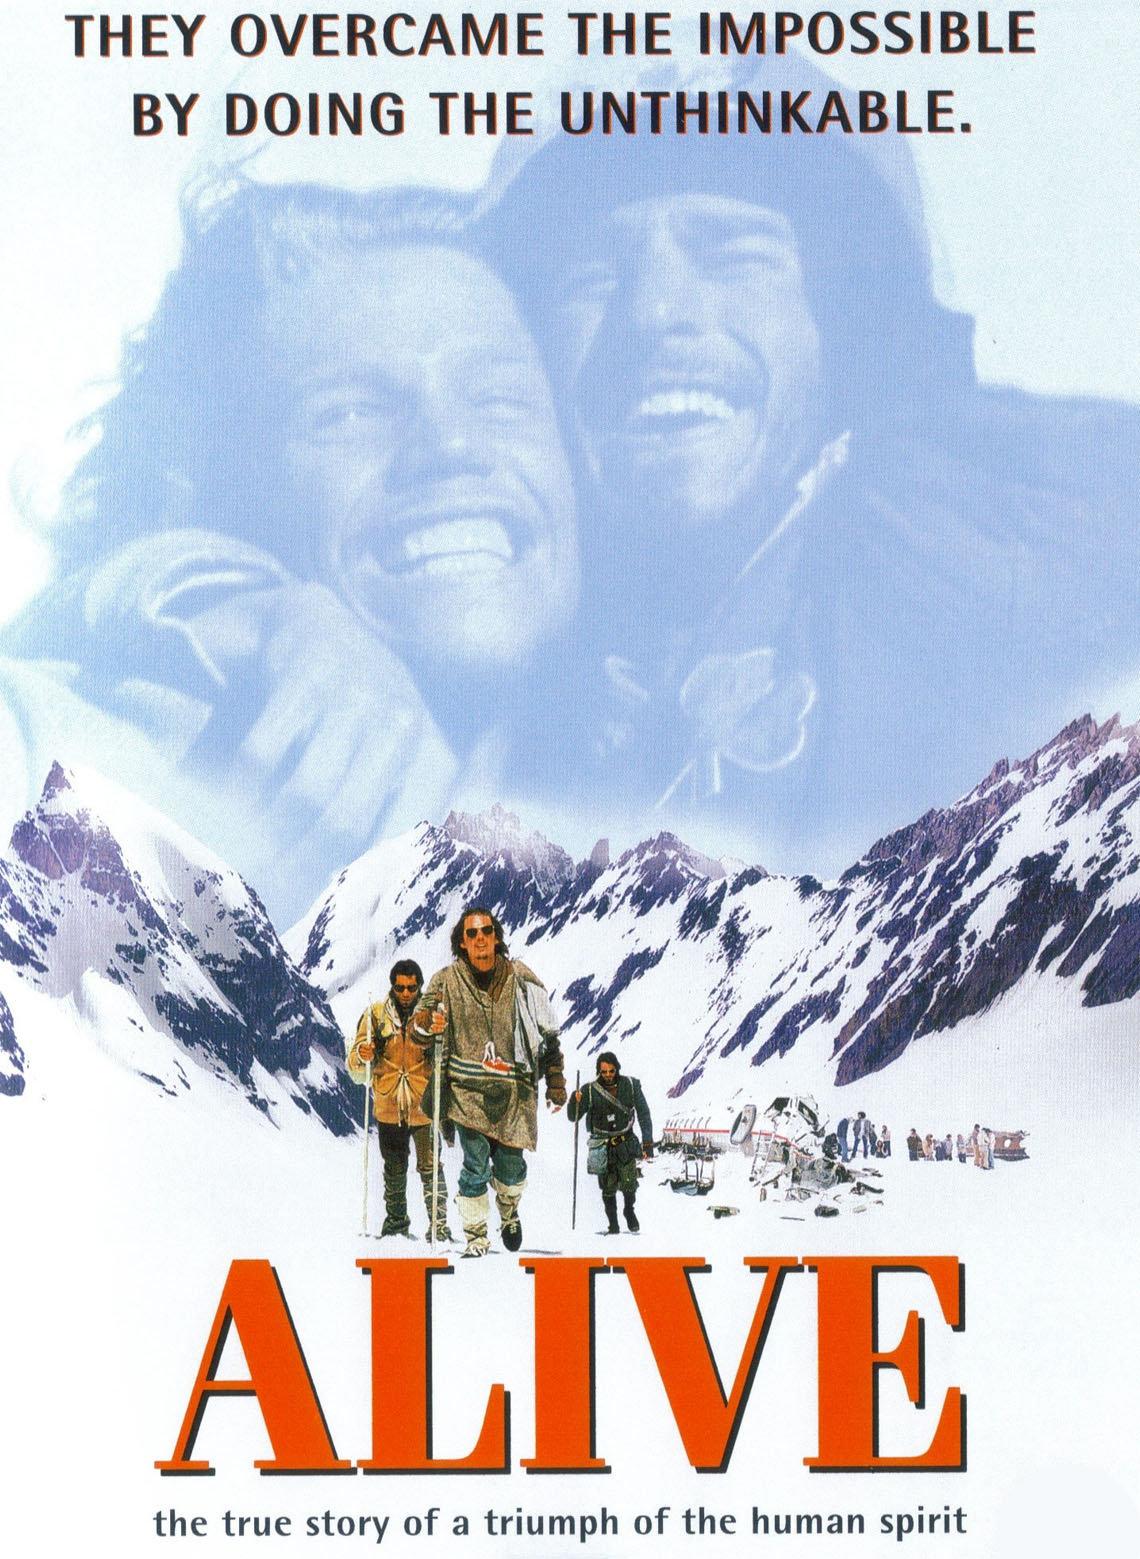 alive-1993-movie-poster